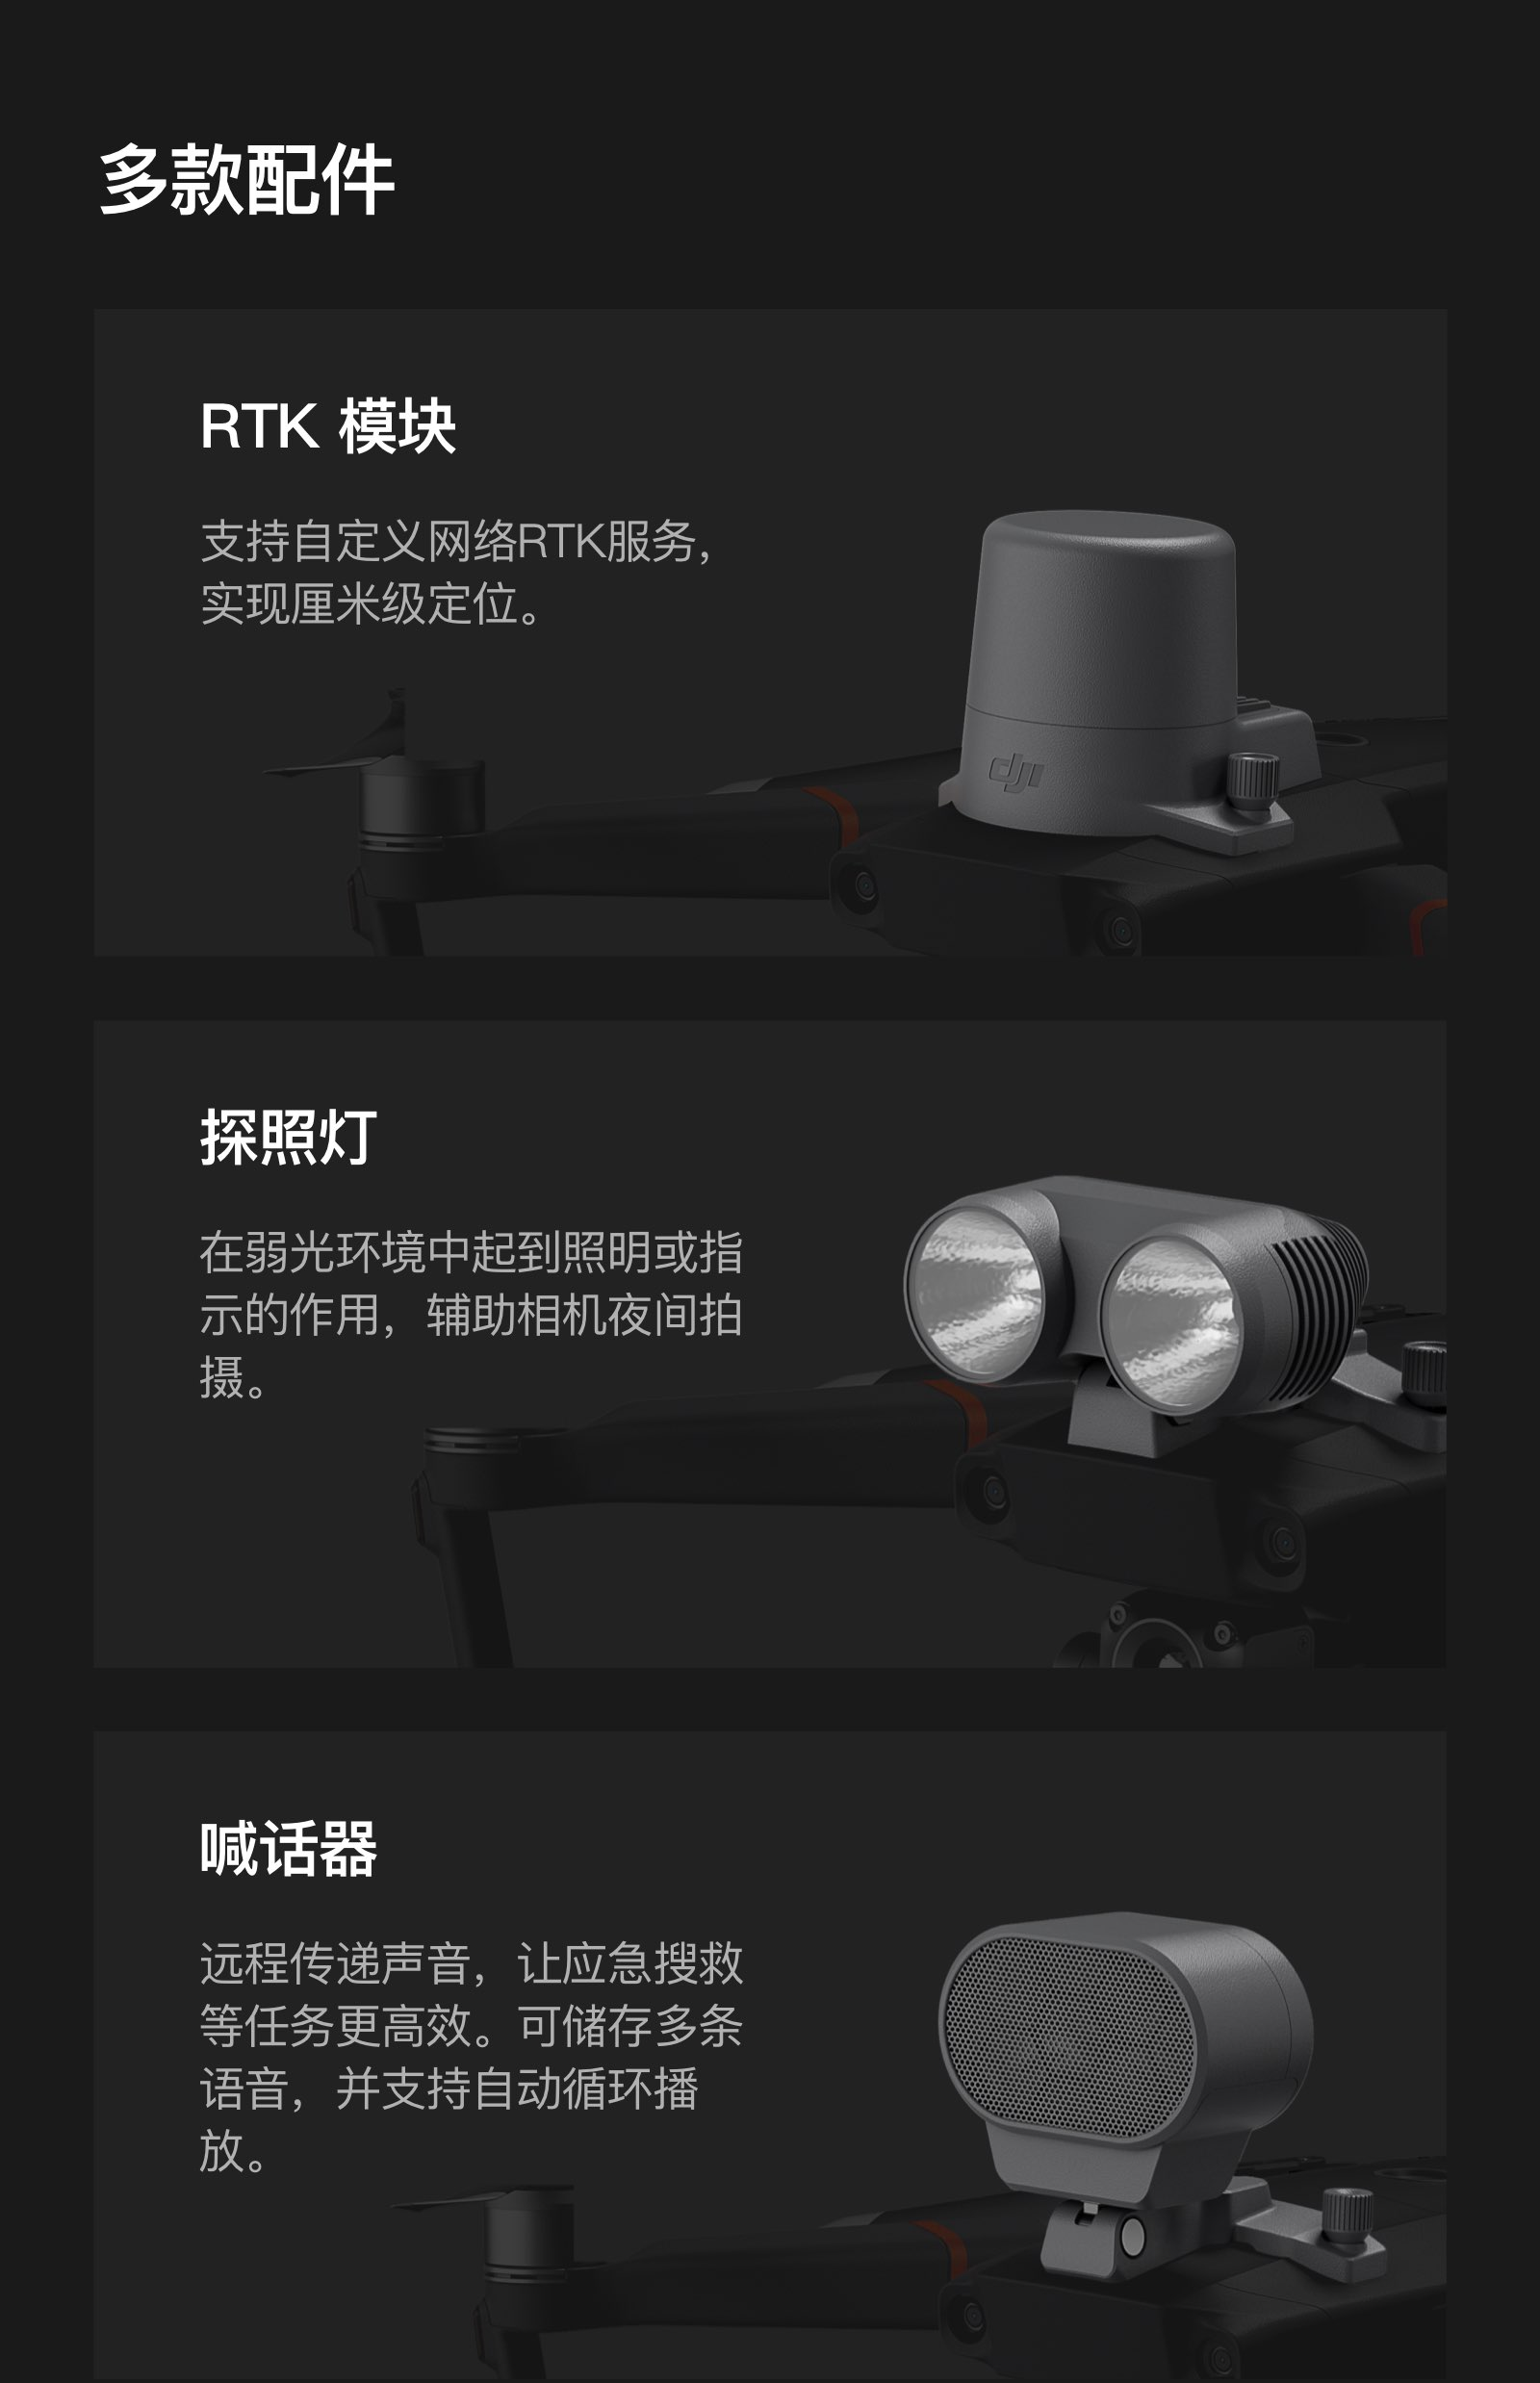 M2EA_PC%20_cn_11.jpg